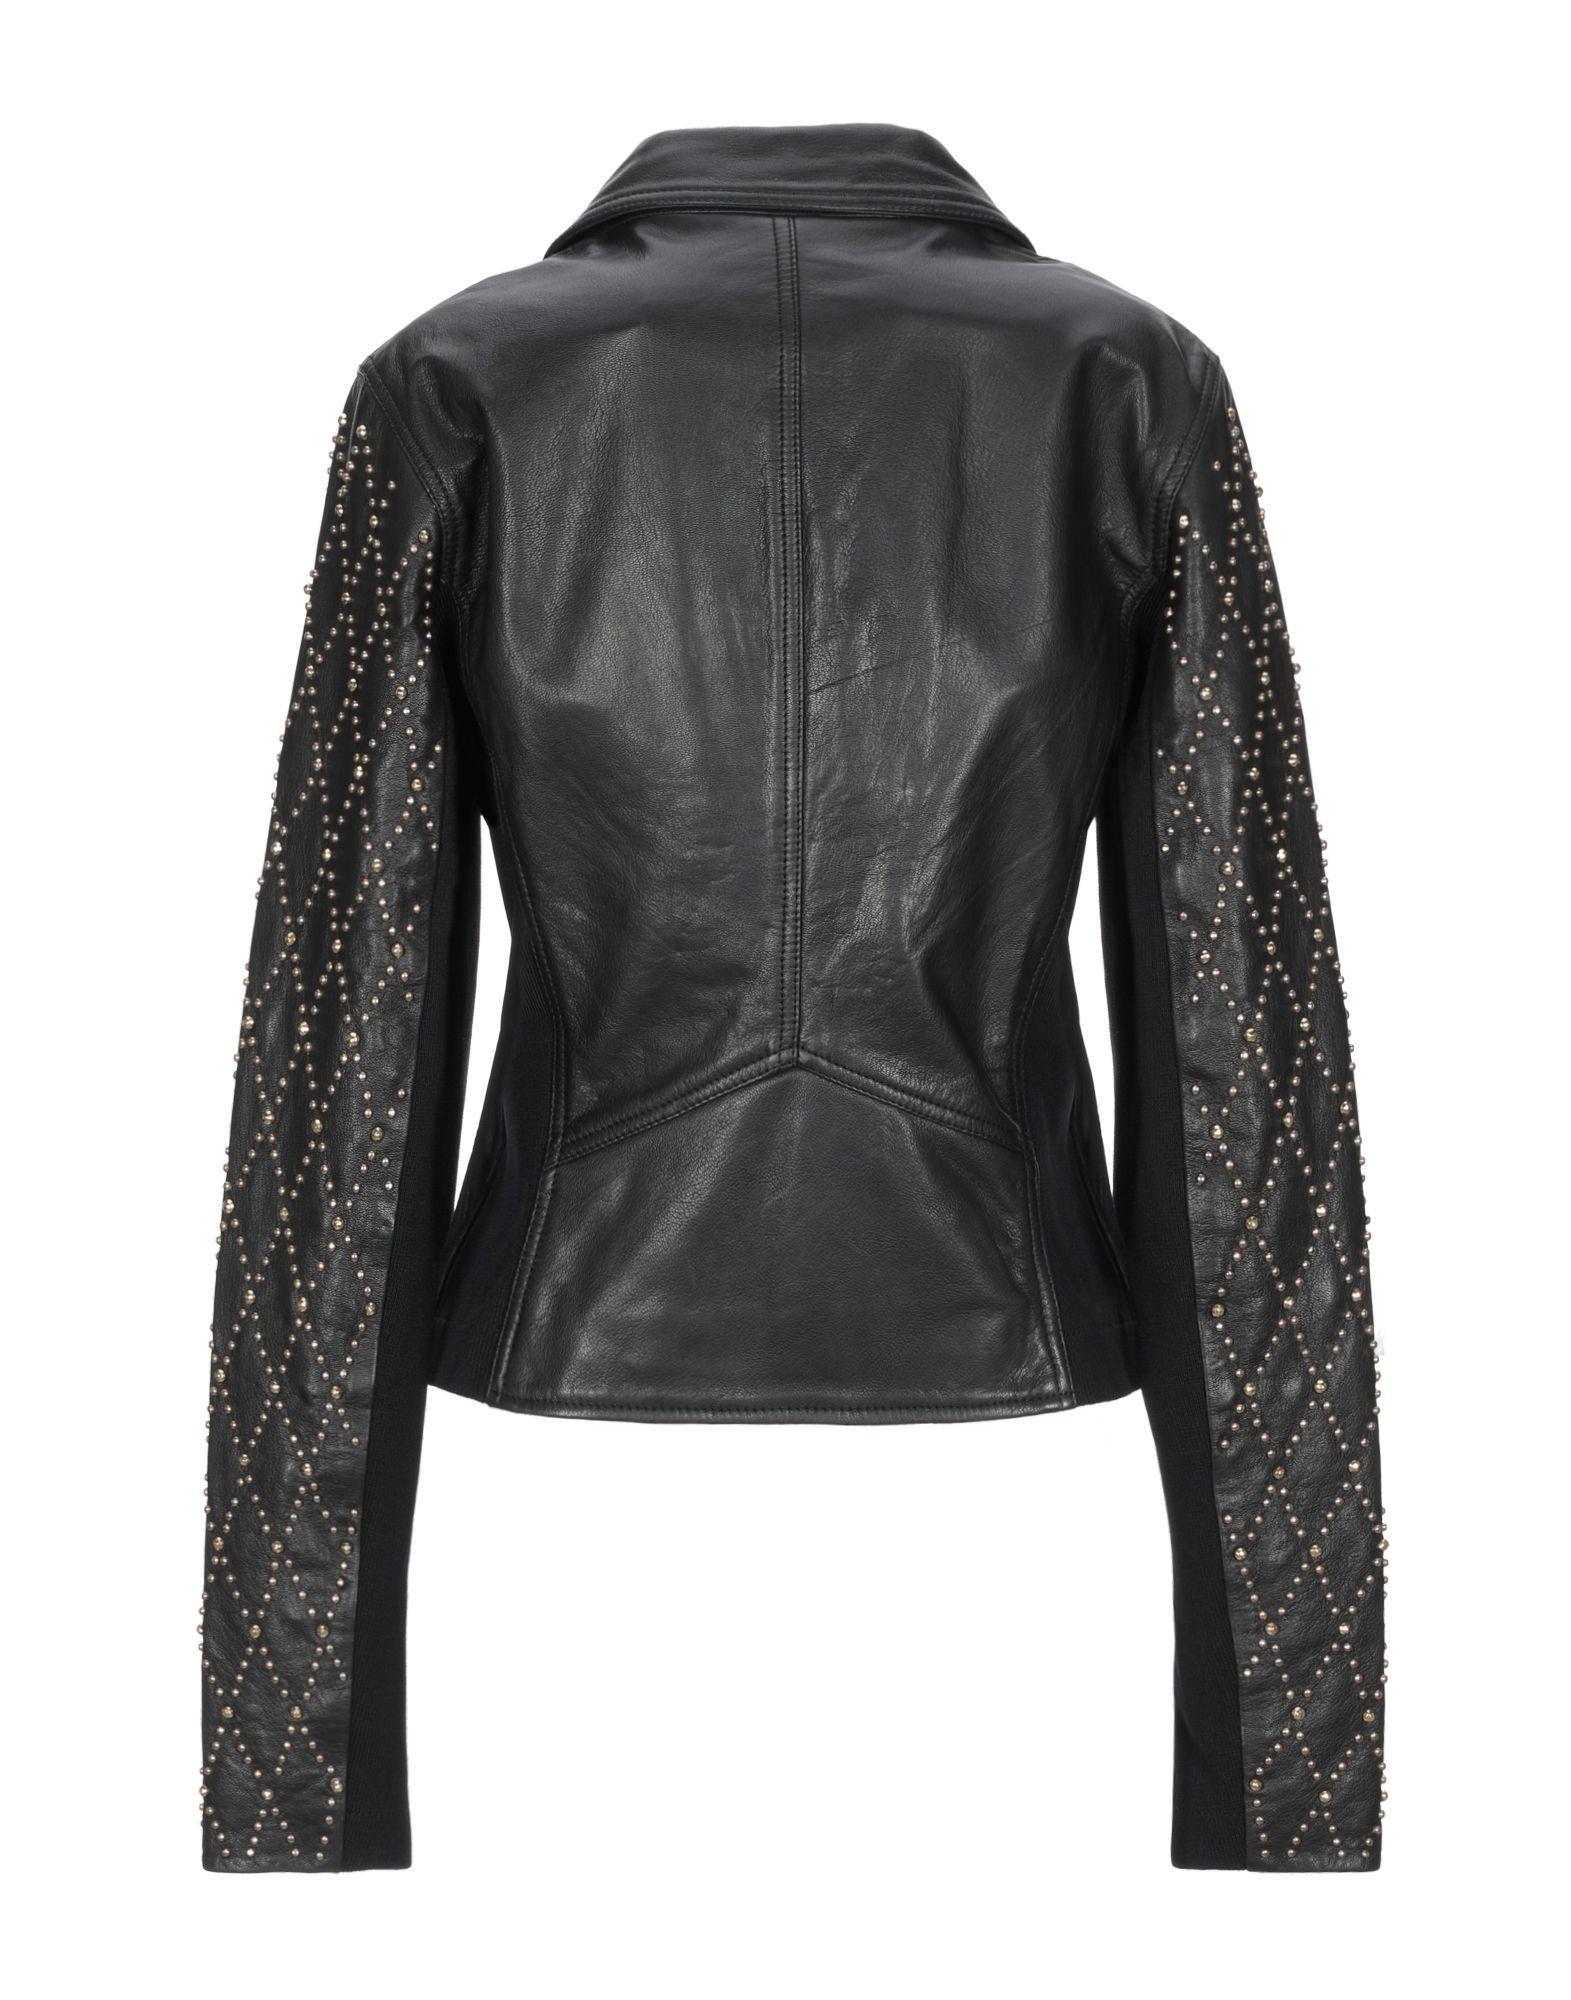 Versace Leather Jacket in Black